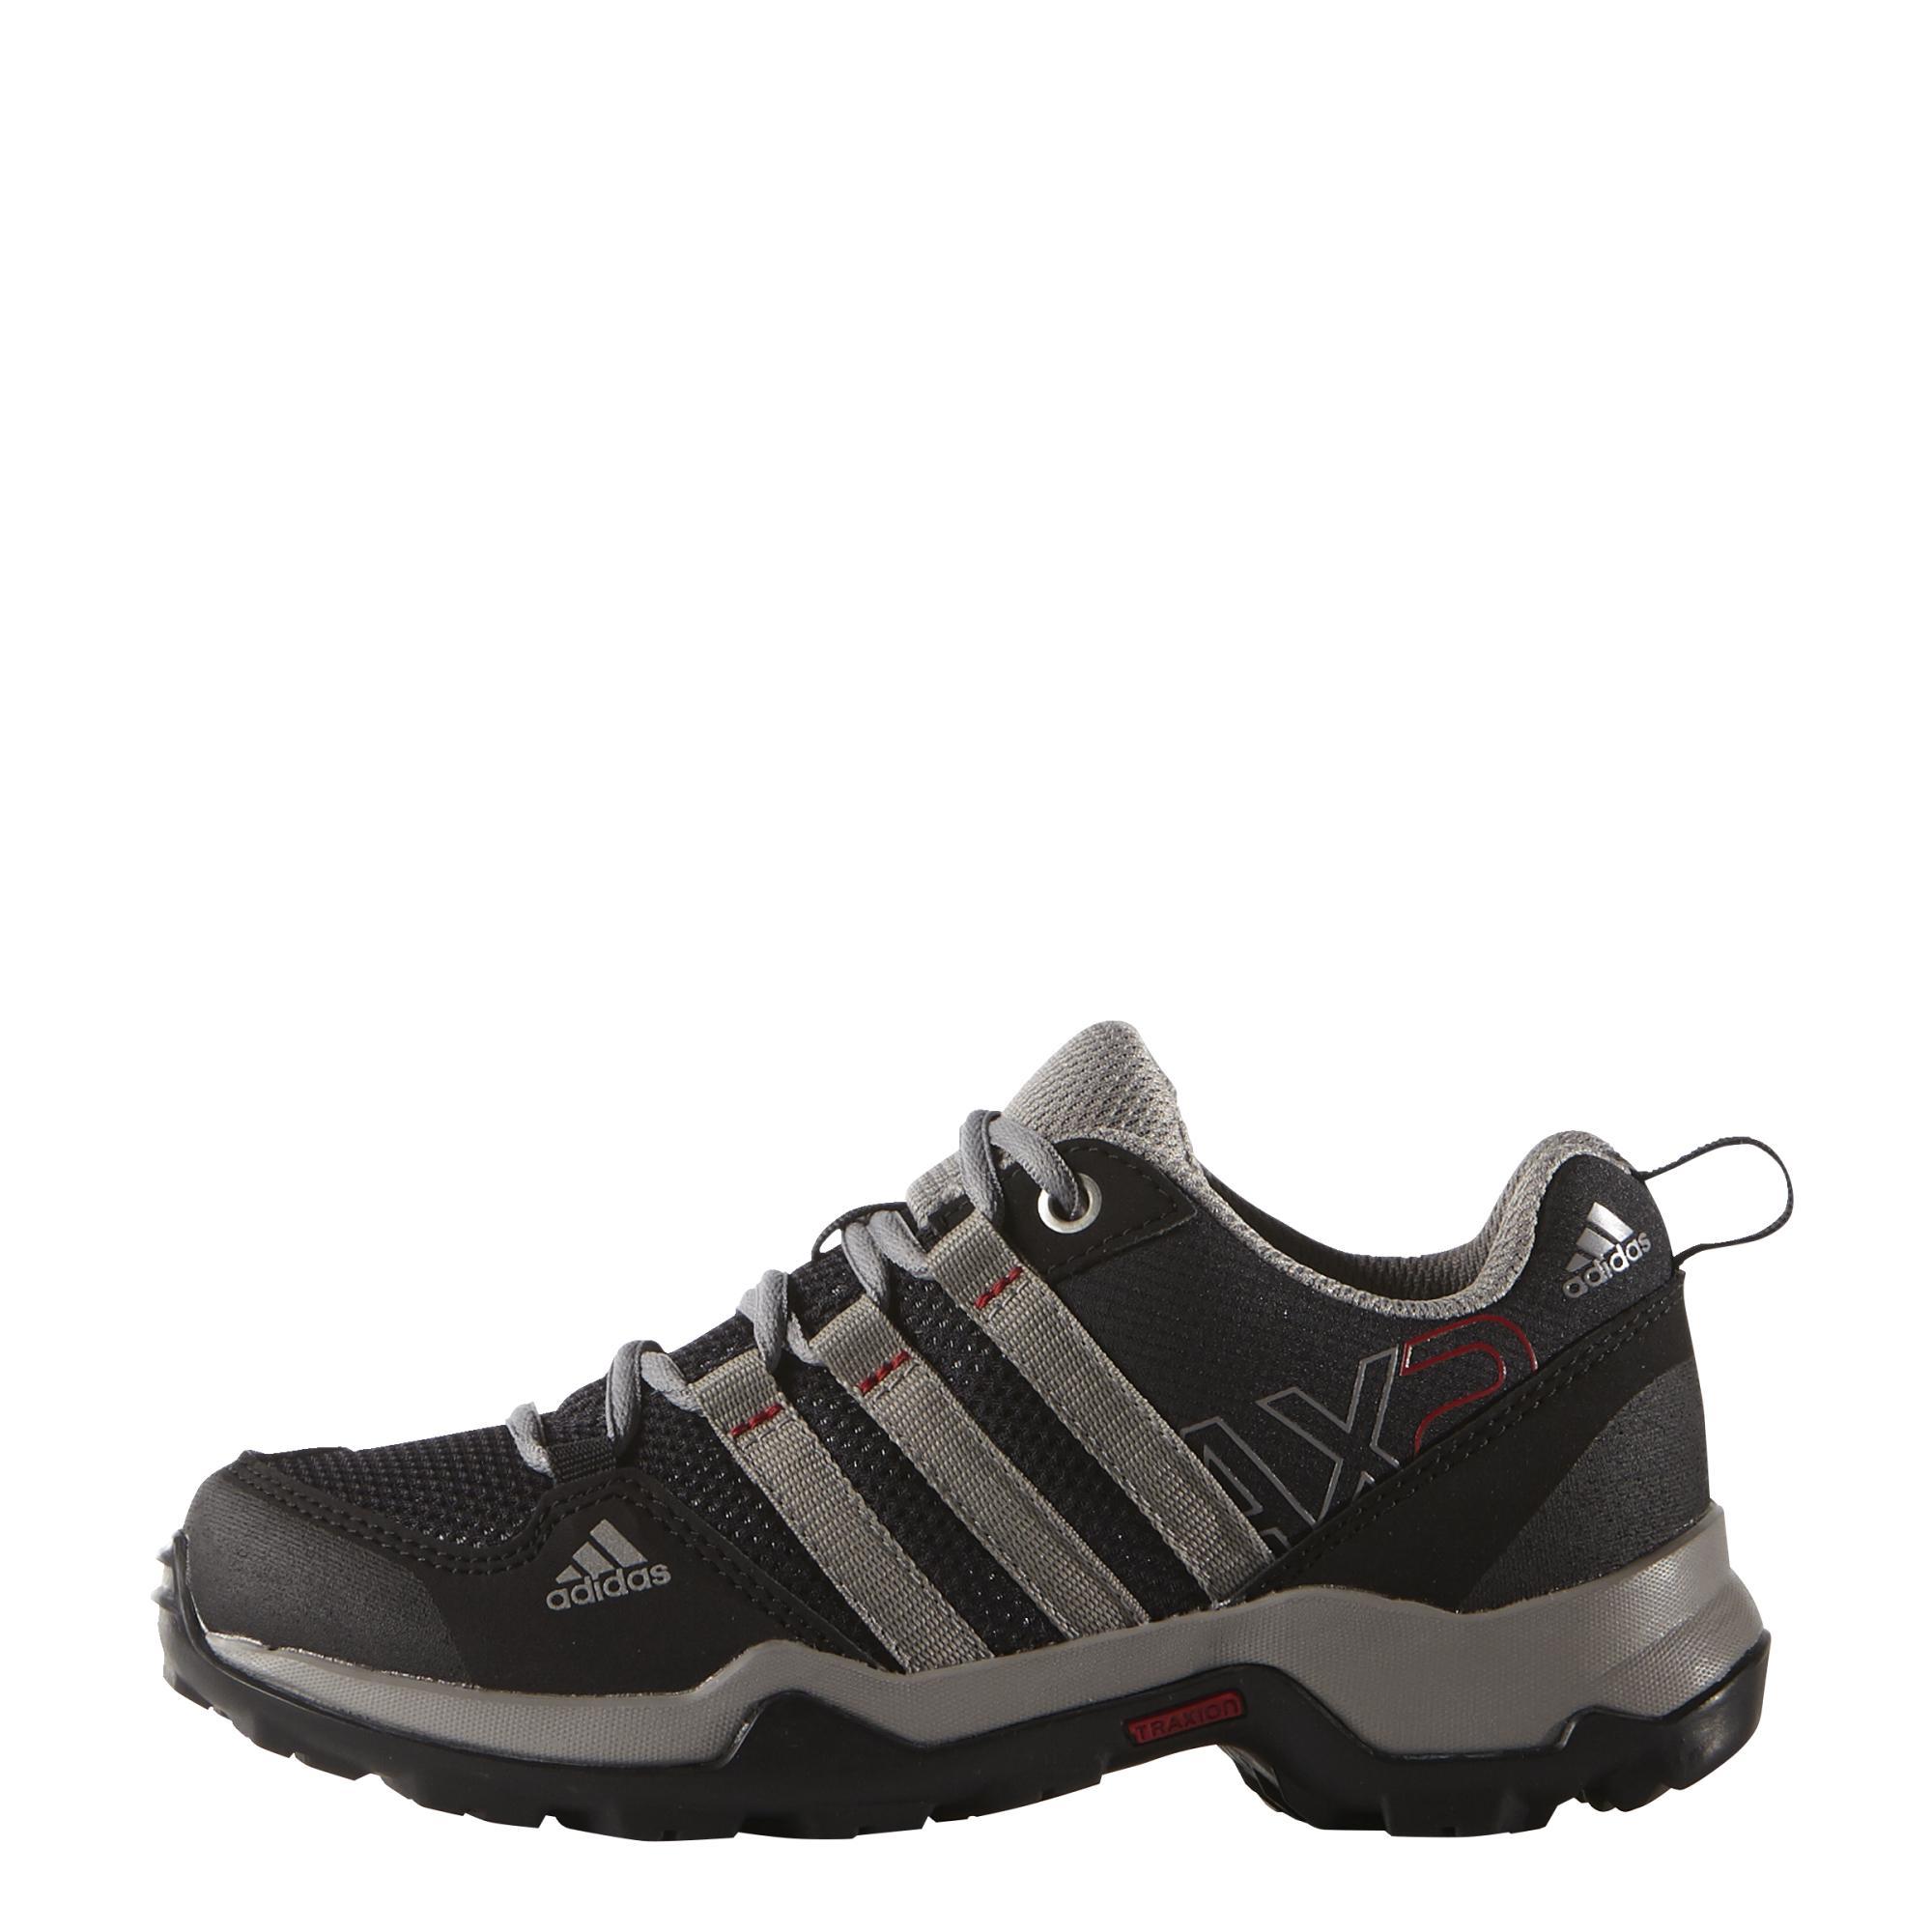 Buty Sportowe Adidas AX2 K (D67136) Czarne, Szare, Srebrne